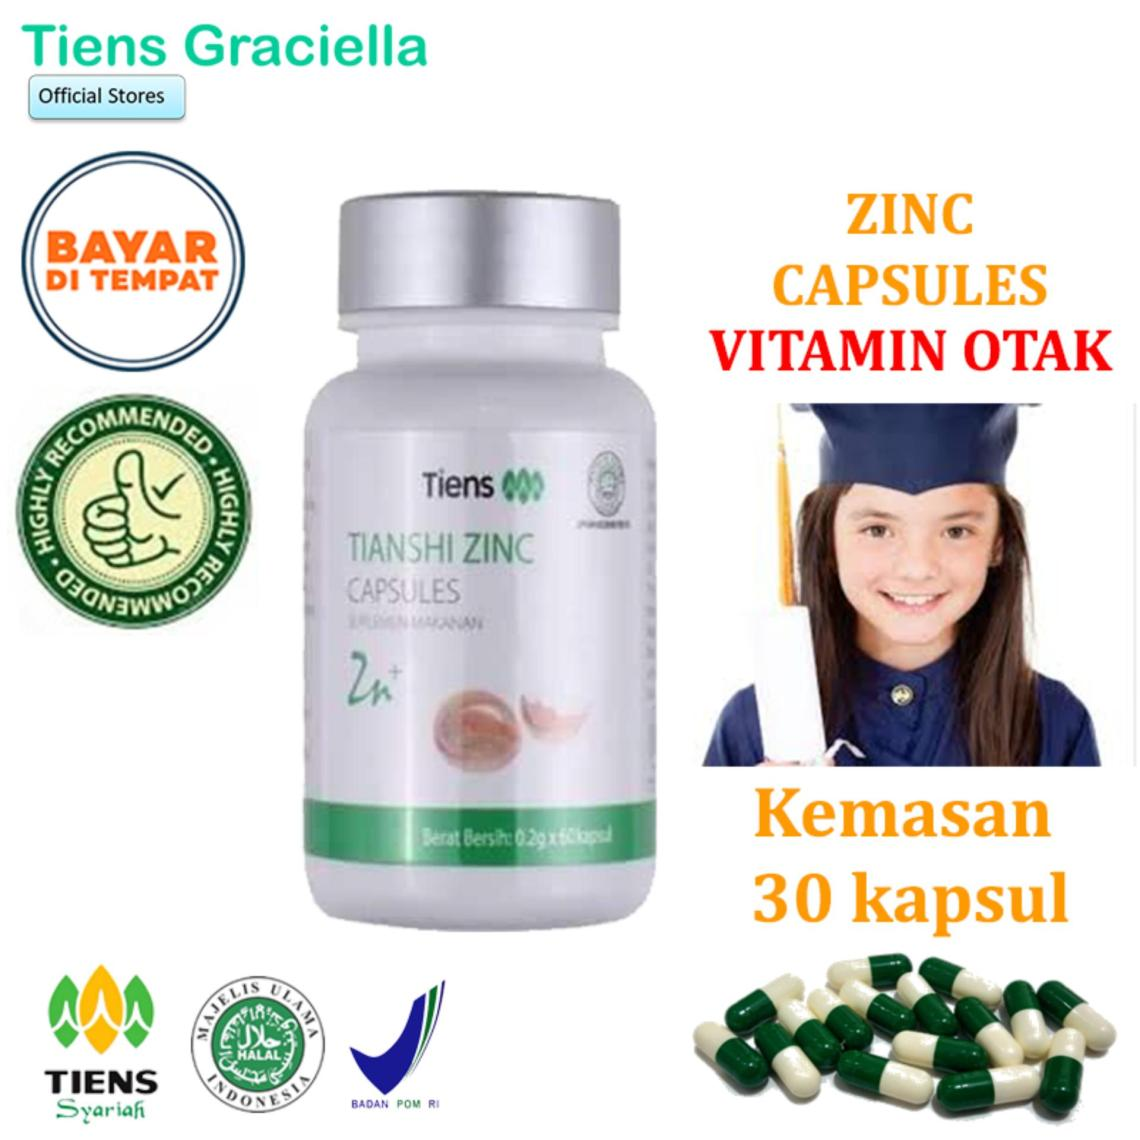 Tiens Zinc Vitamin Otak Peningkat Daya Ingat Penambah Kecerdasan Penambah Stamina Anak Paket Promo Banting Harga 30 Kapsul + GRATIS Kartu Member Tiens Graciella